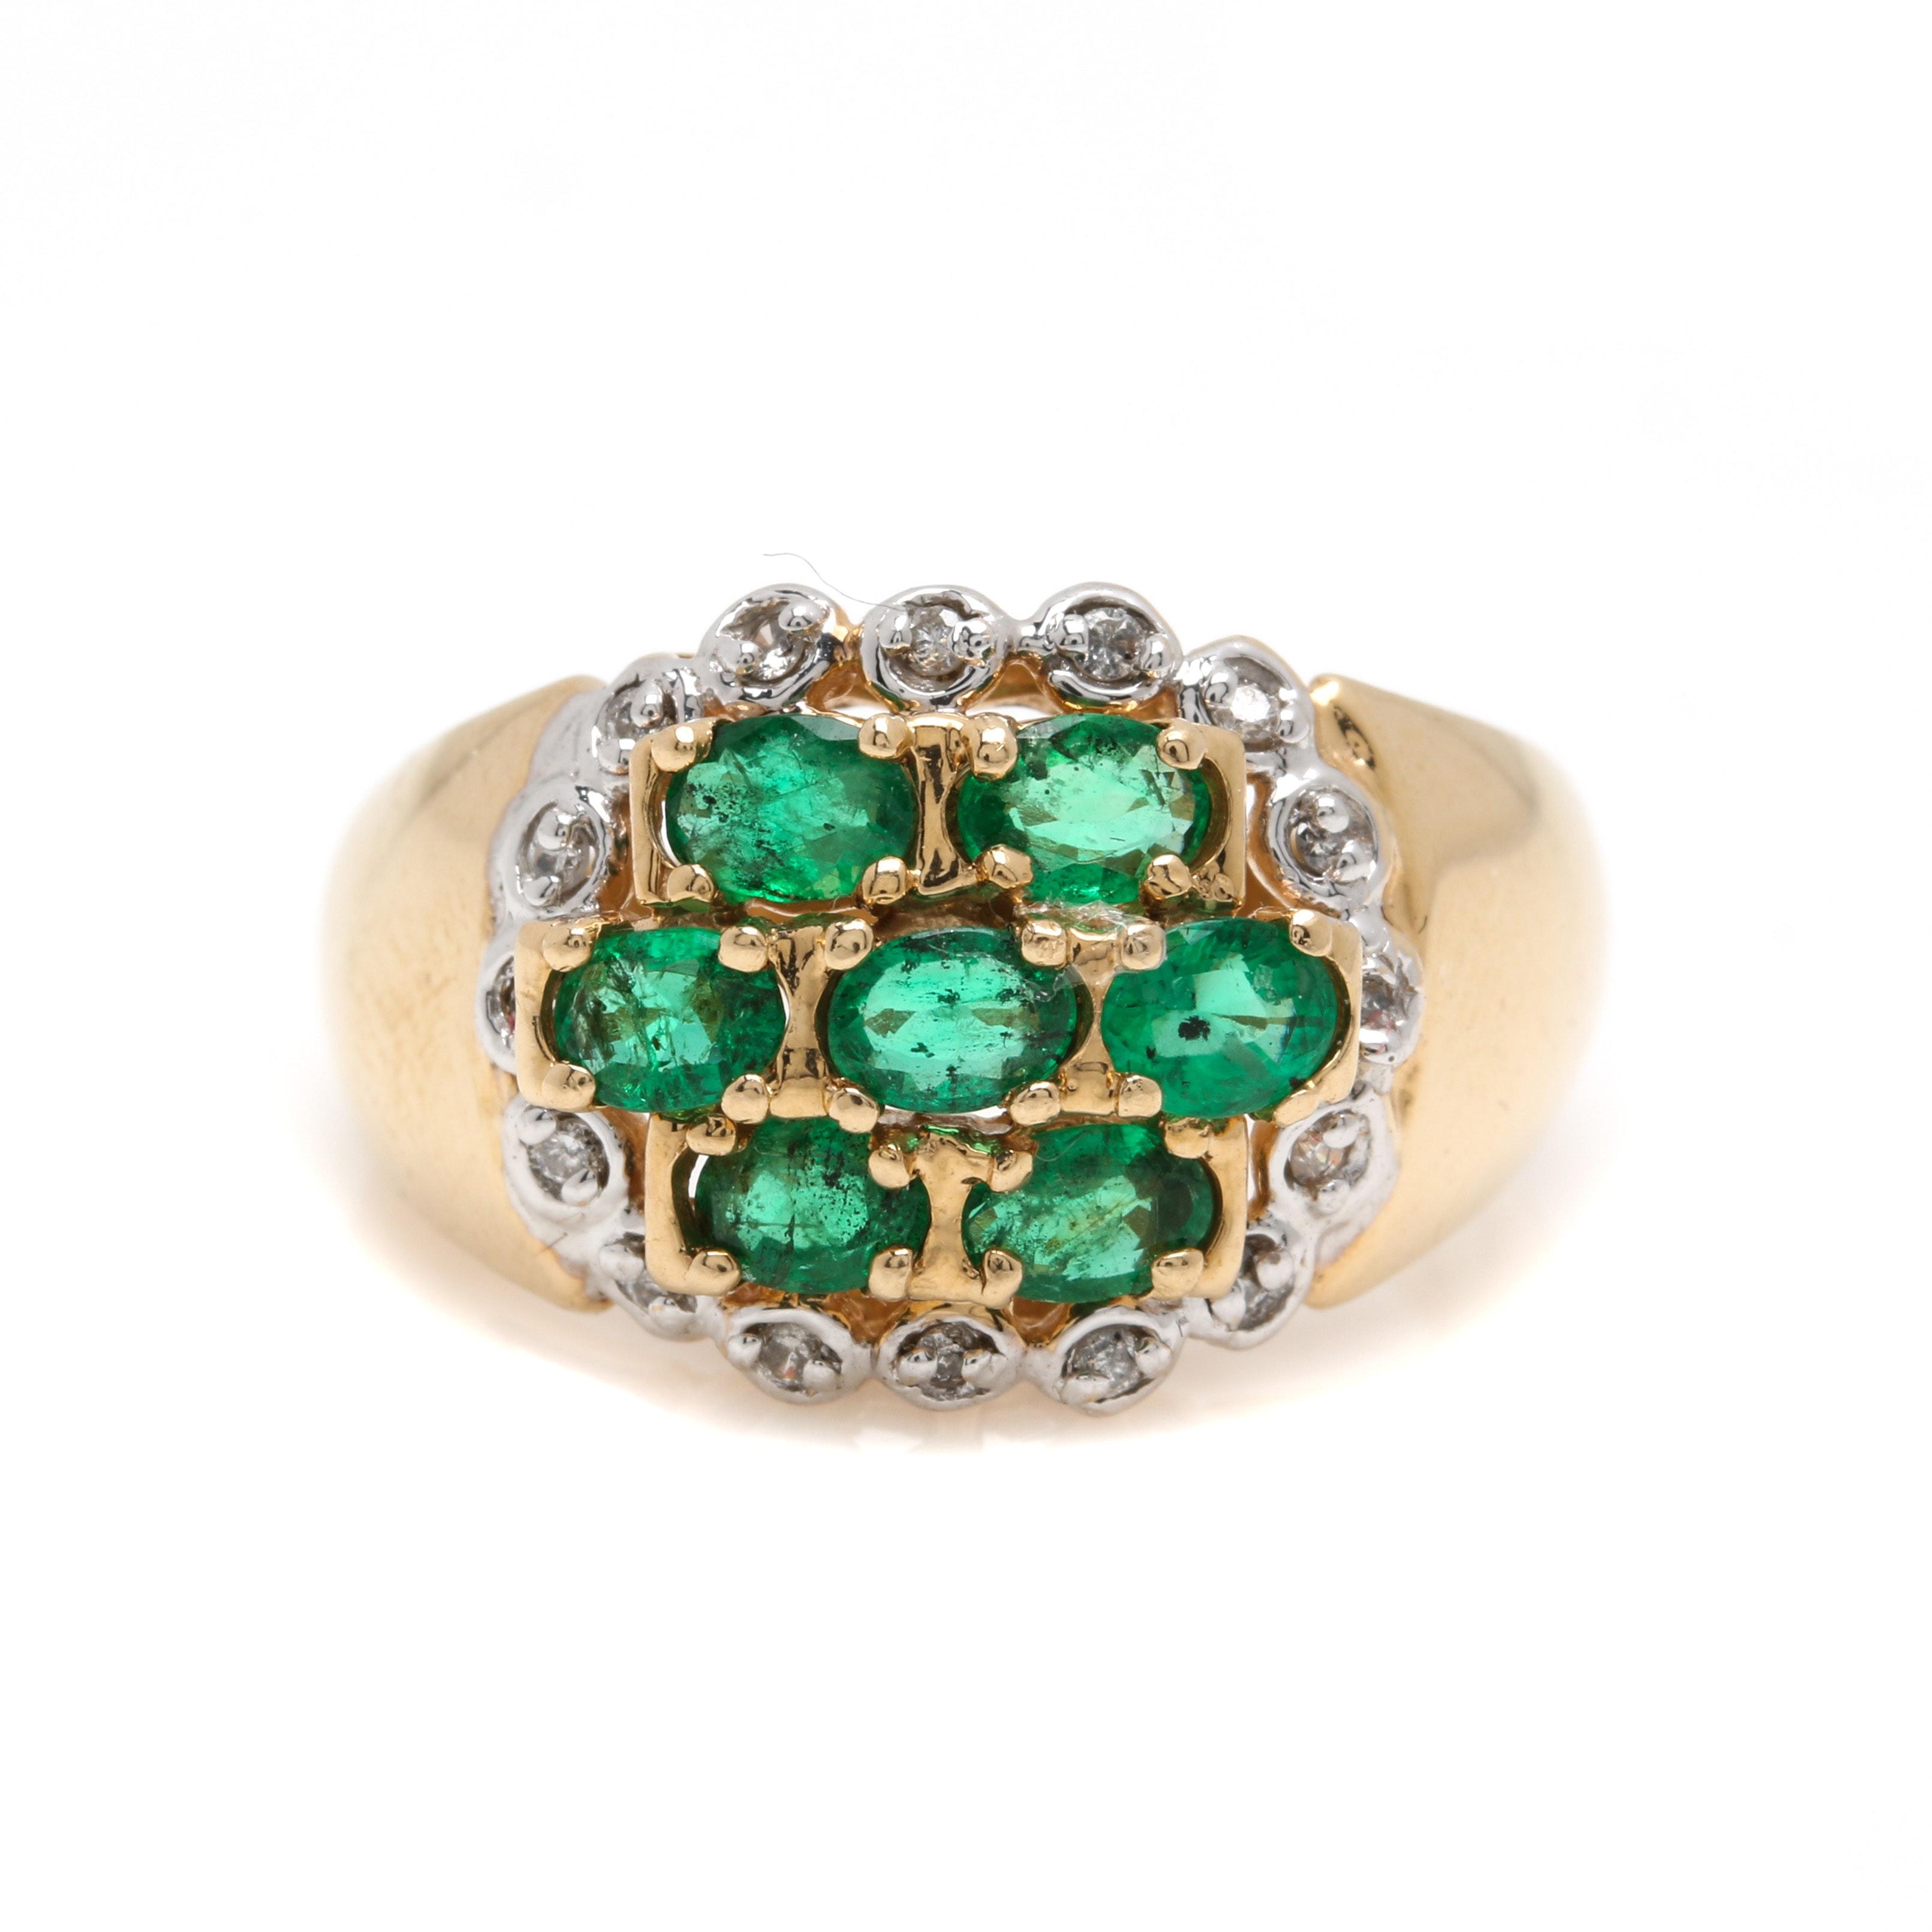 14K Yellow Gold Emerald and Diamond Ring